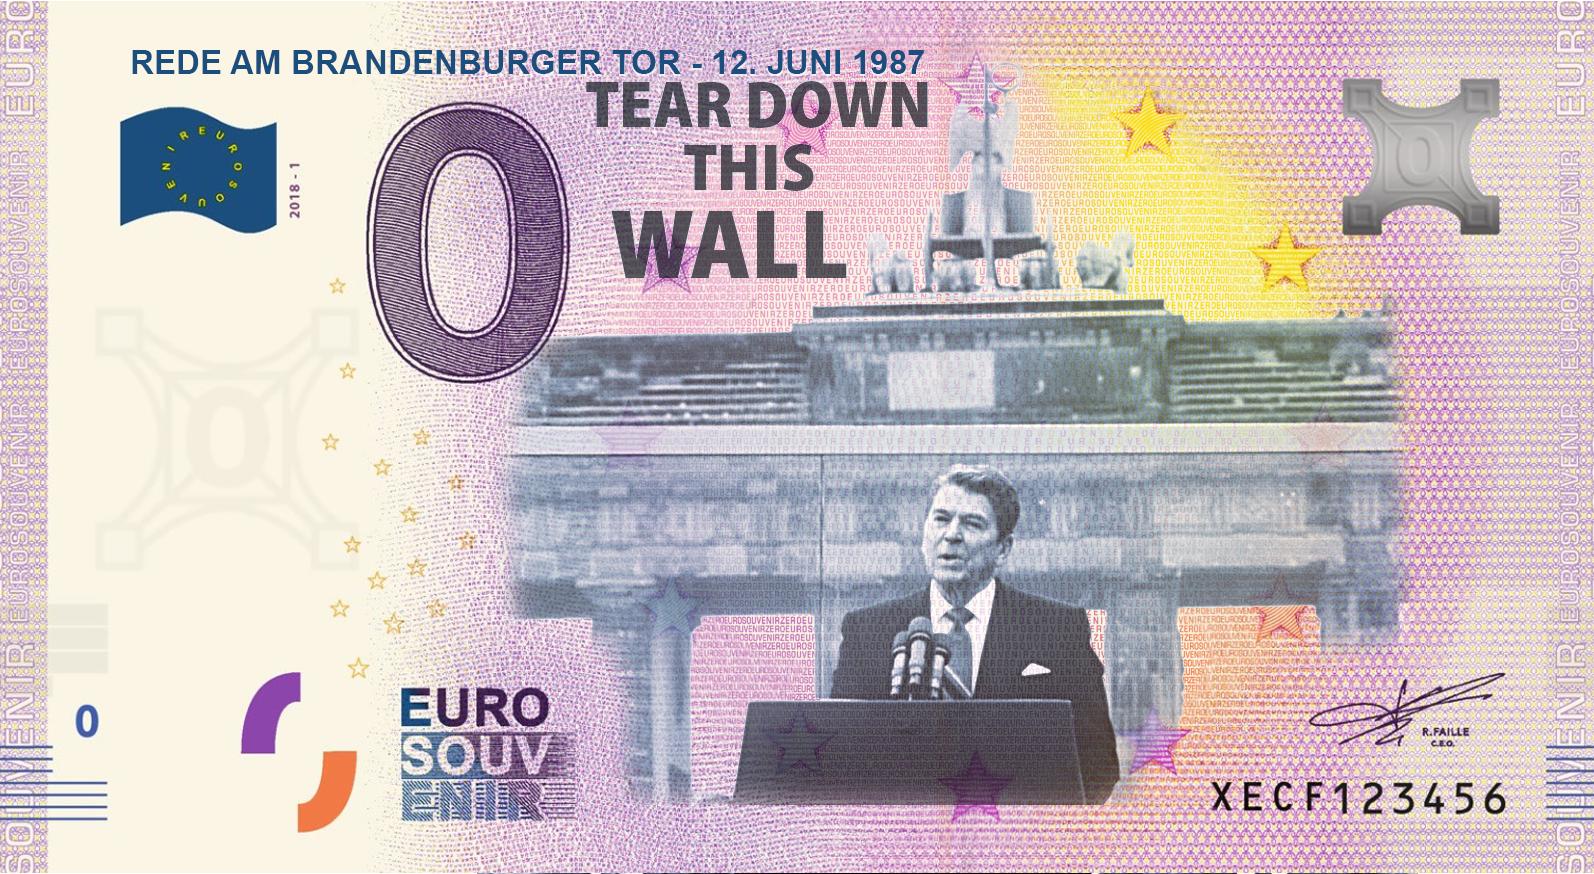 MDM's album of zero euro banknotes - 30 years of German Refunded unity